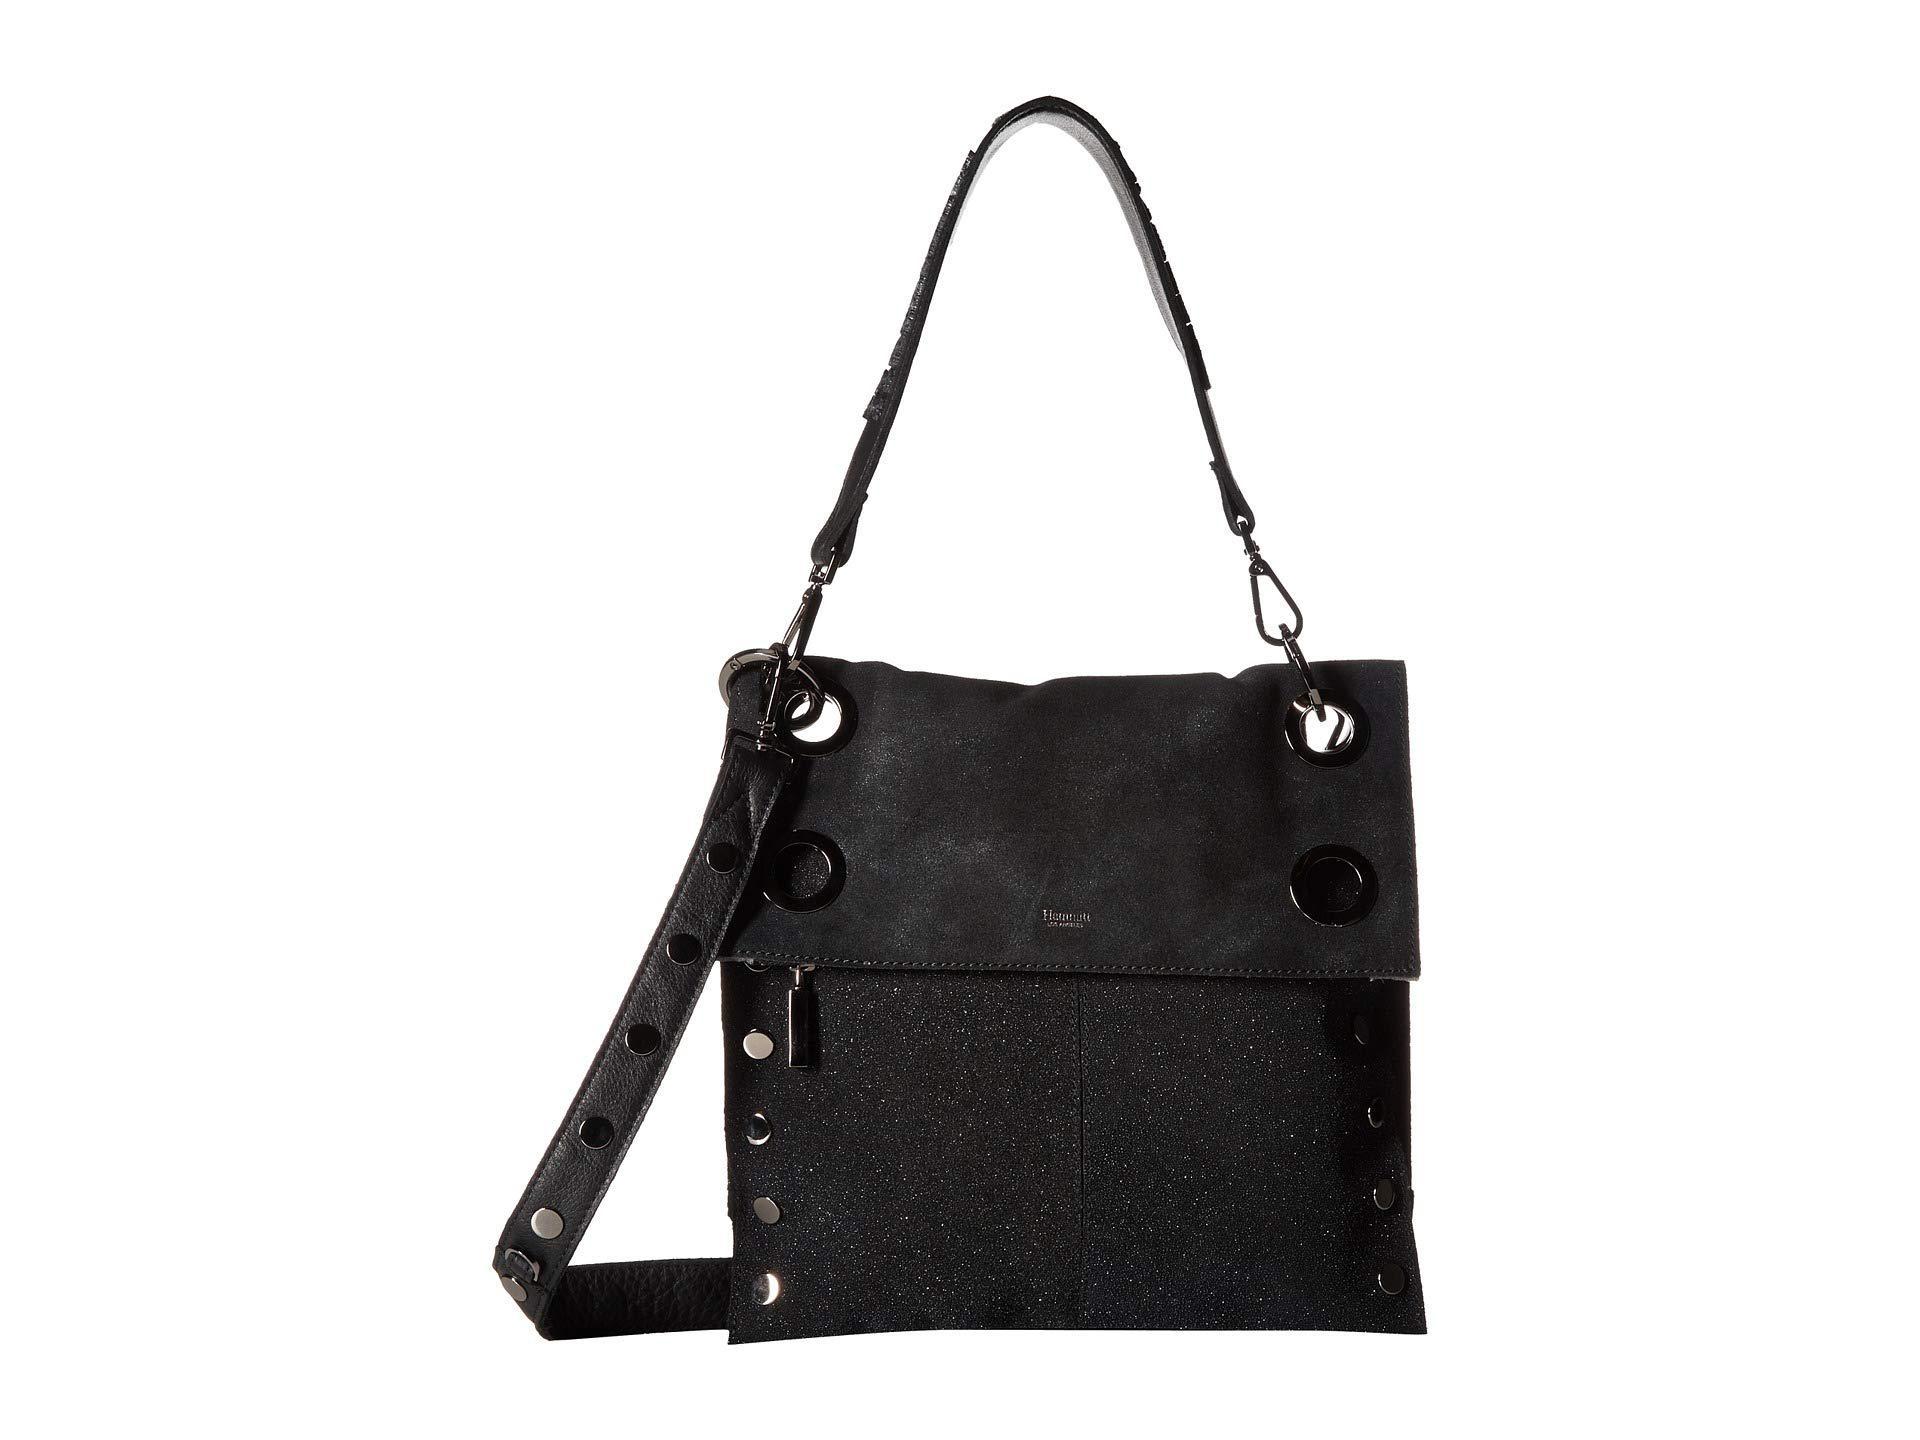 d3972a0629e Hammitt Montana Rev (black/gunmetal) Cross Body Handbags in Blue - Lyst